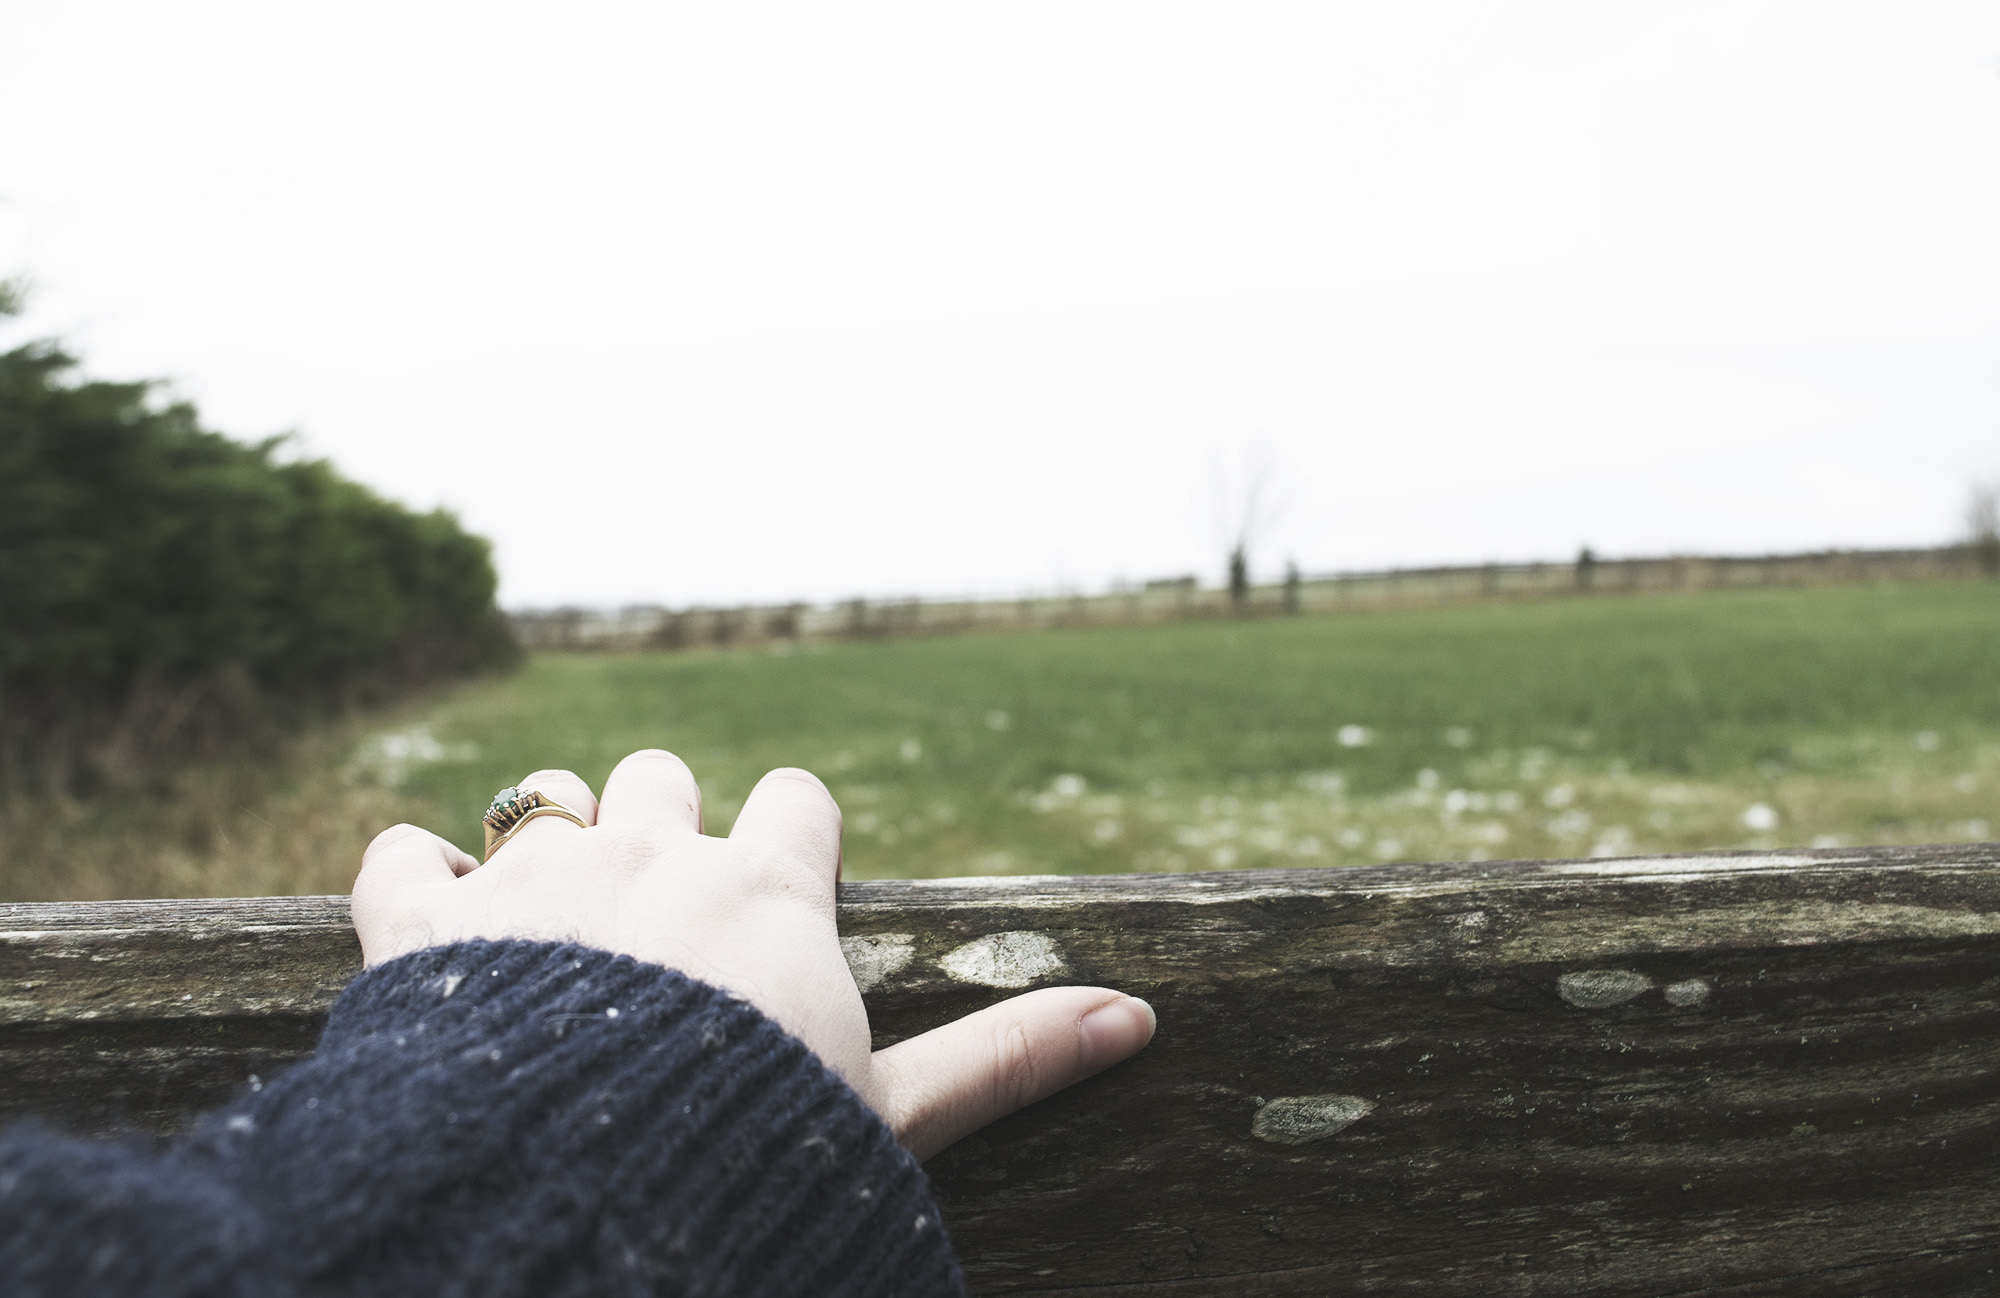 Living Slowly - a blurb